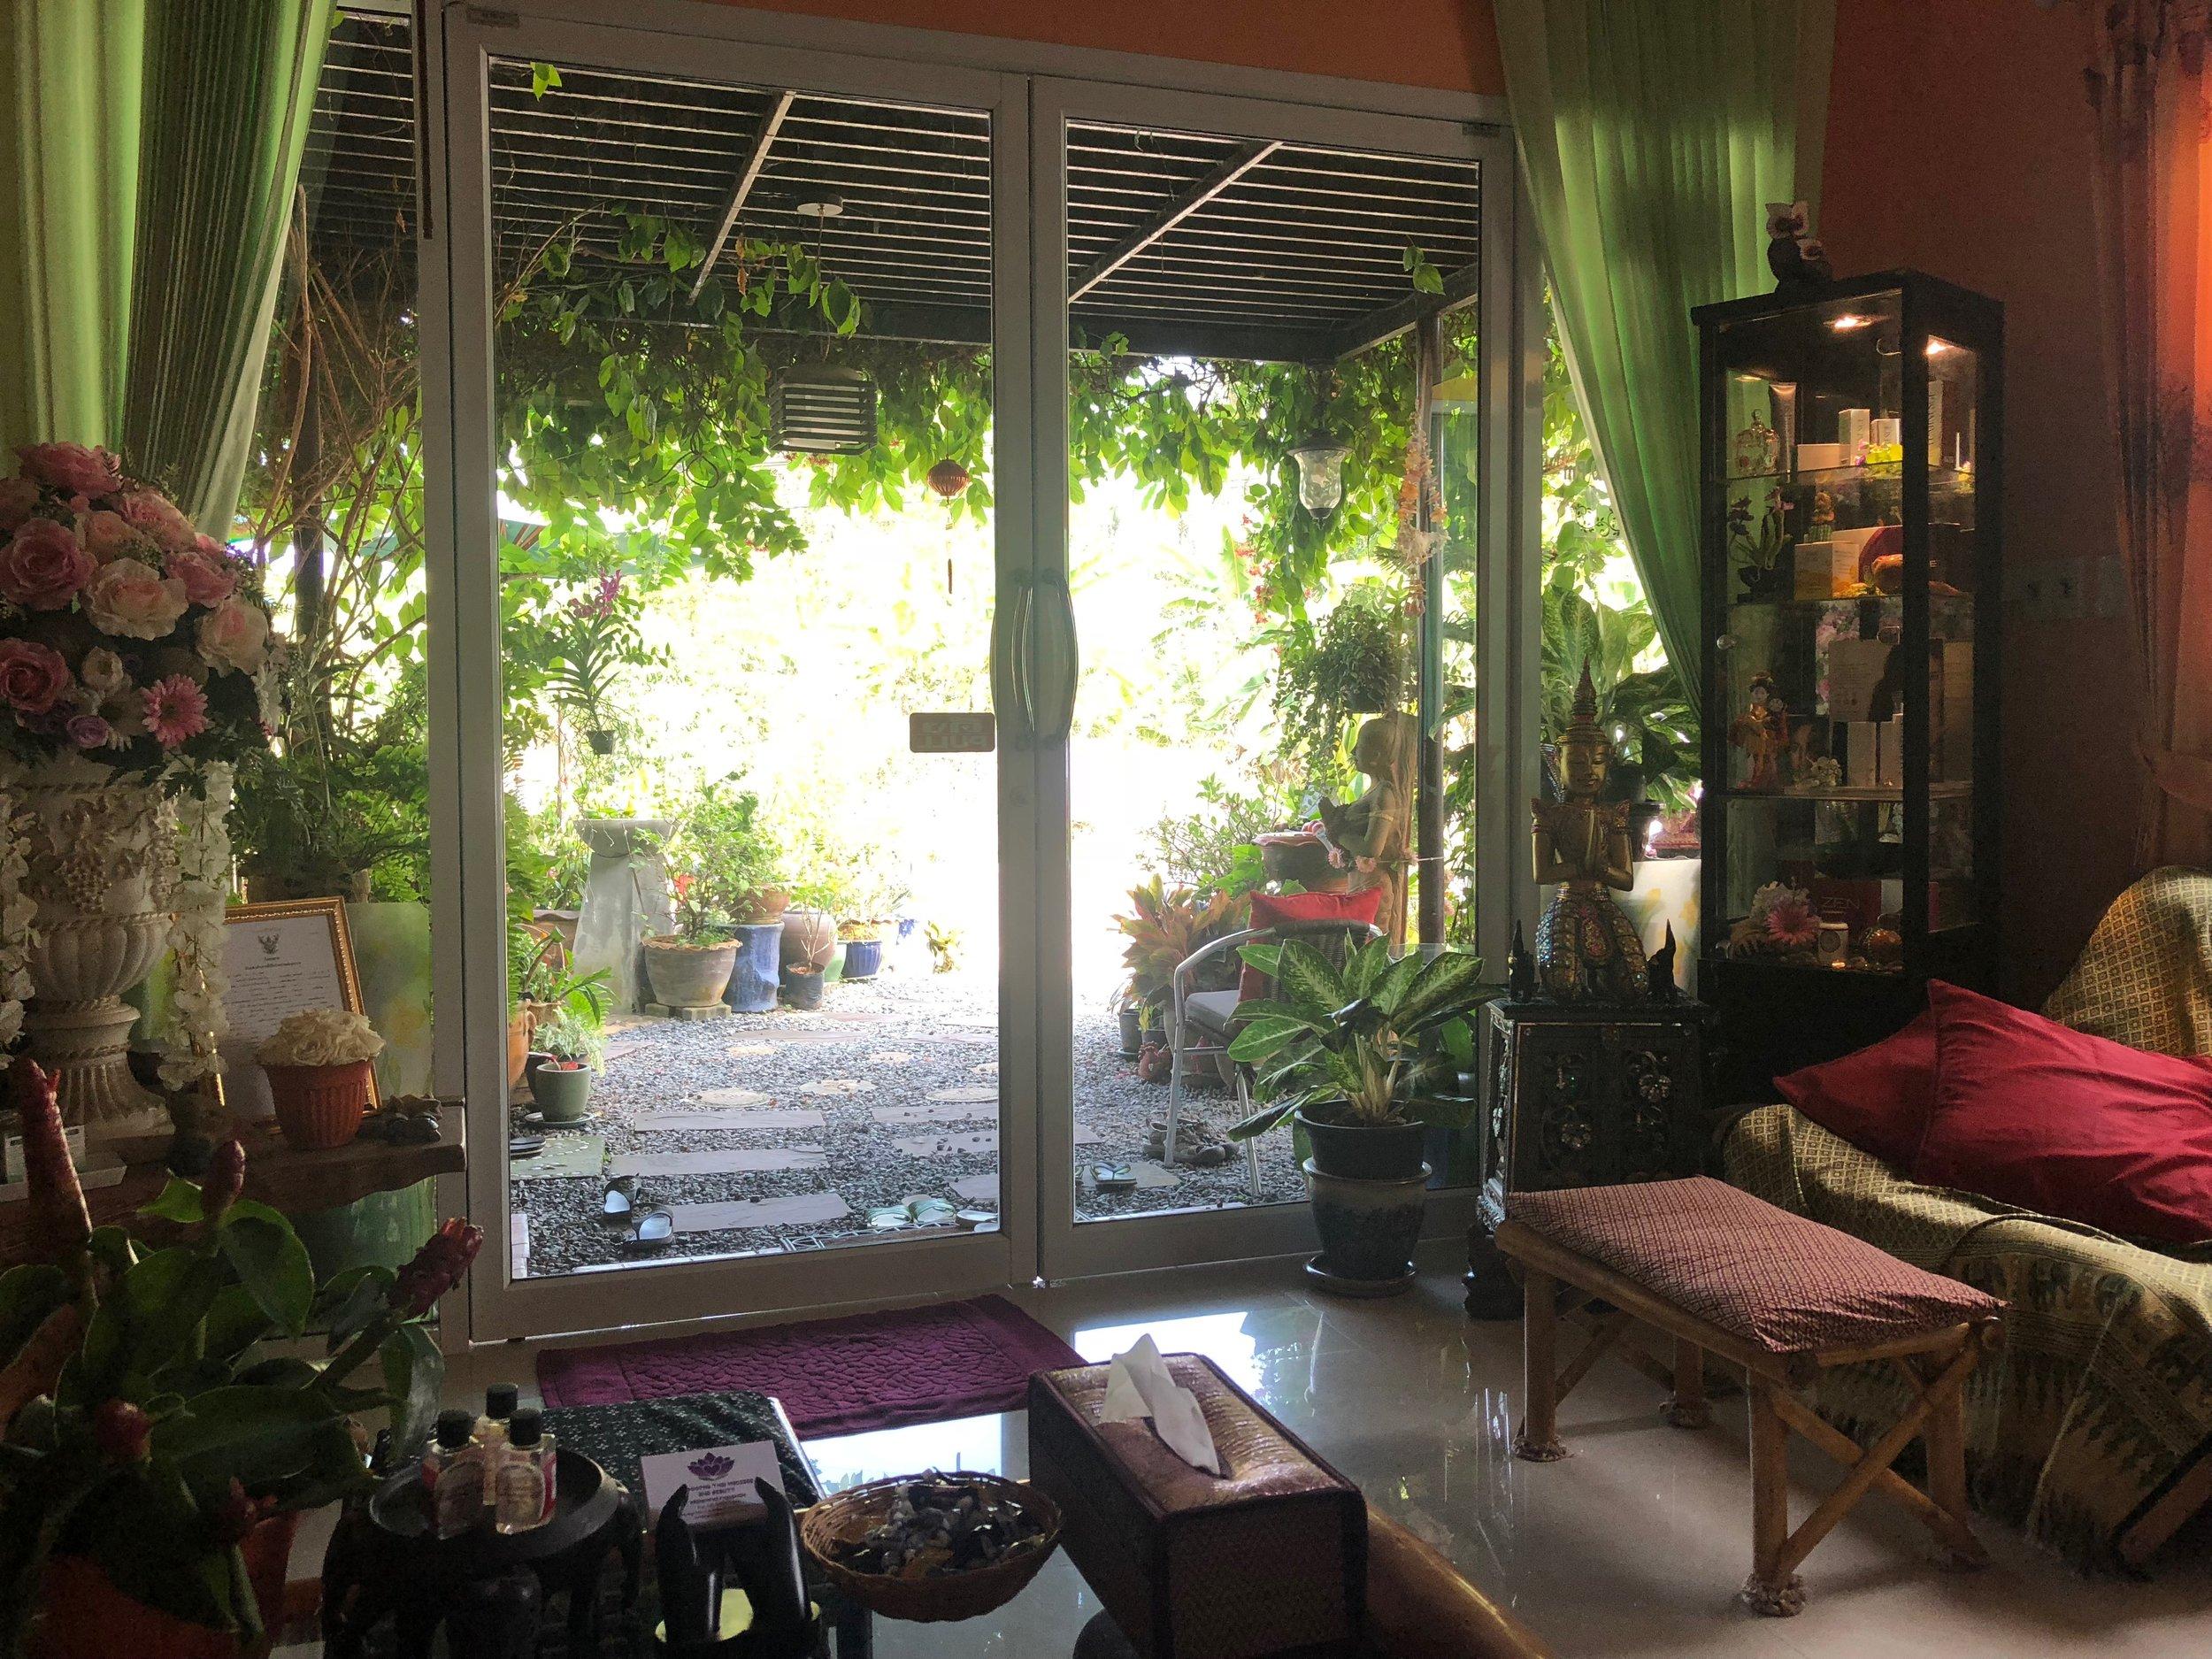 Thai Massage studio